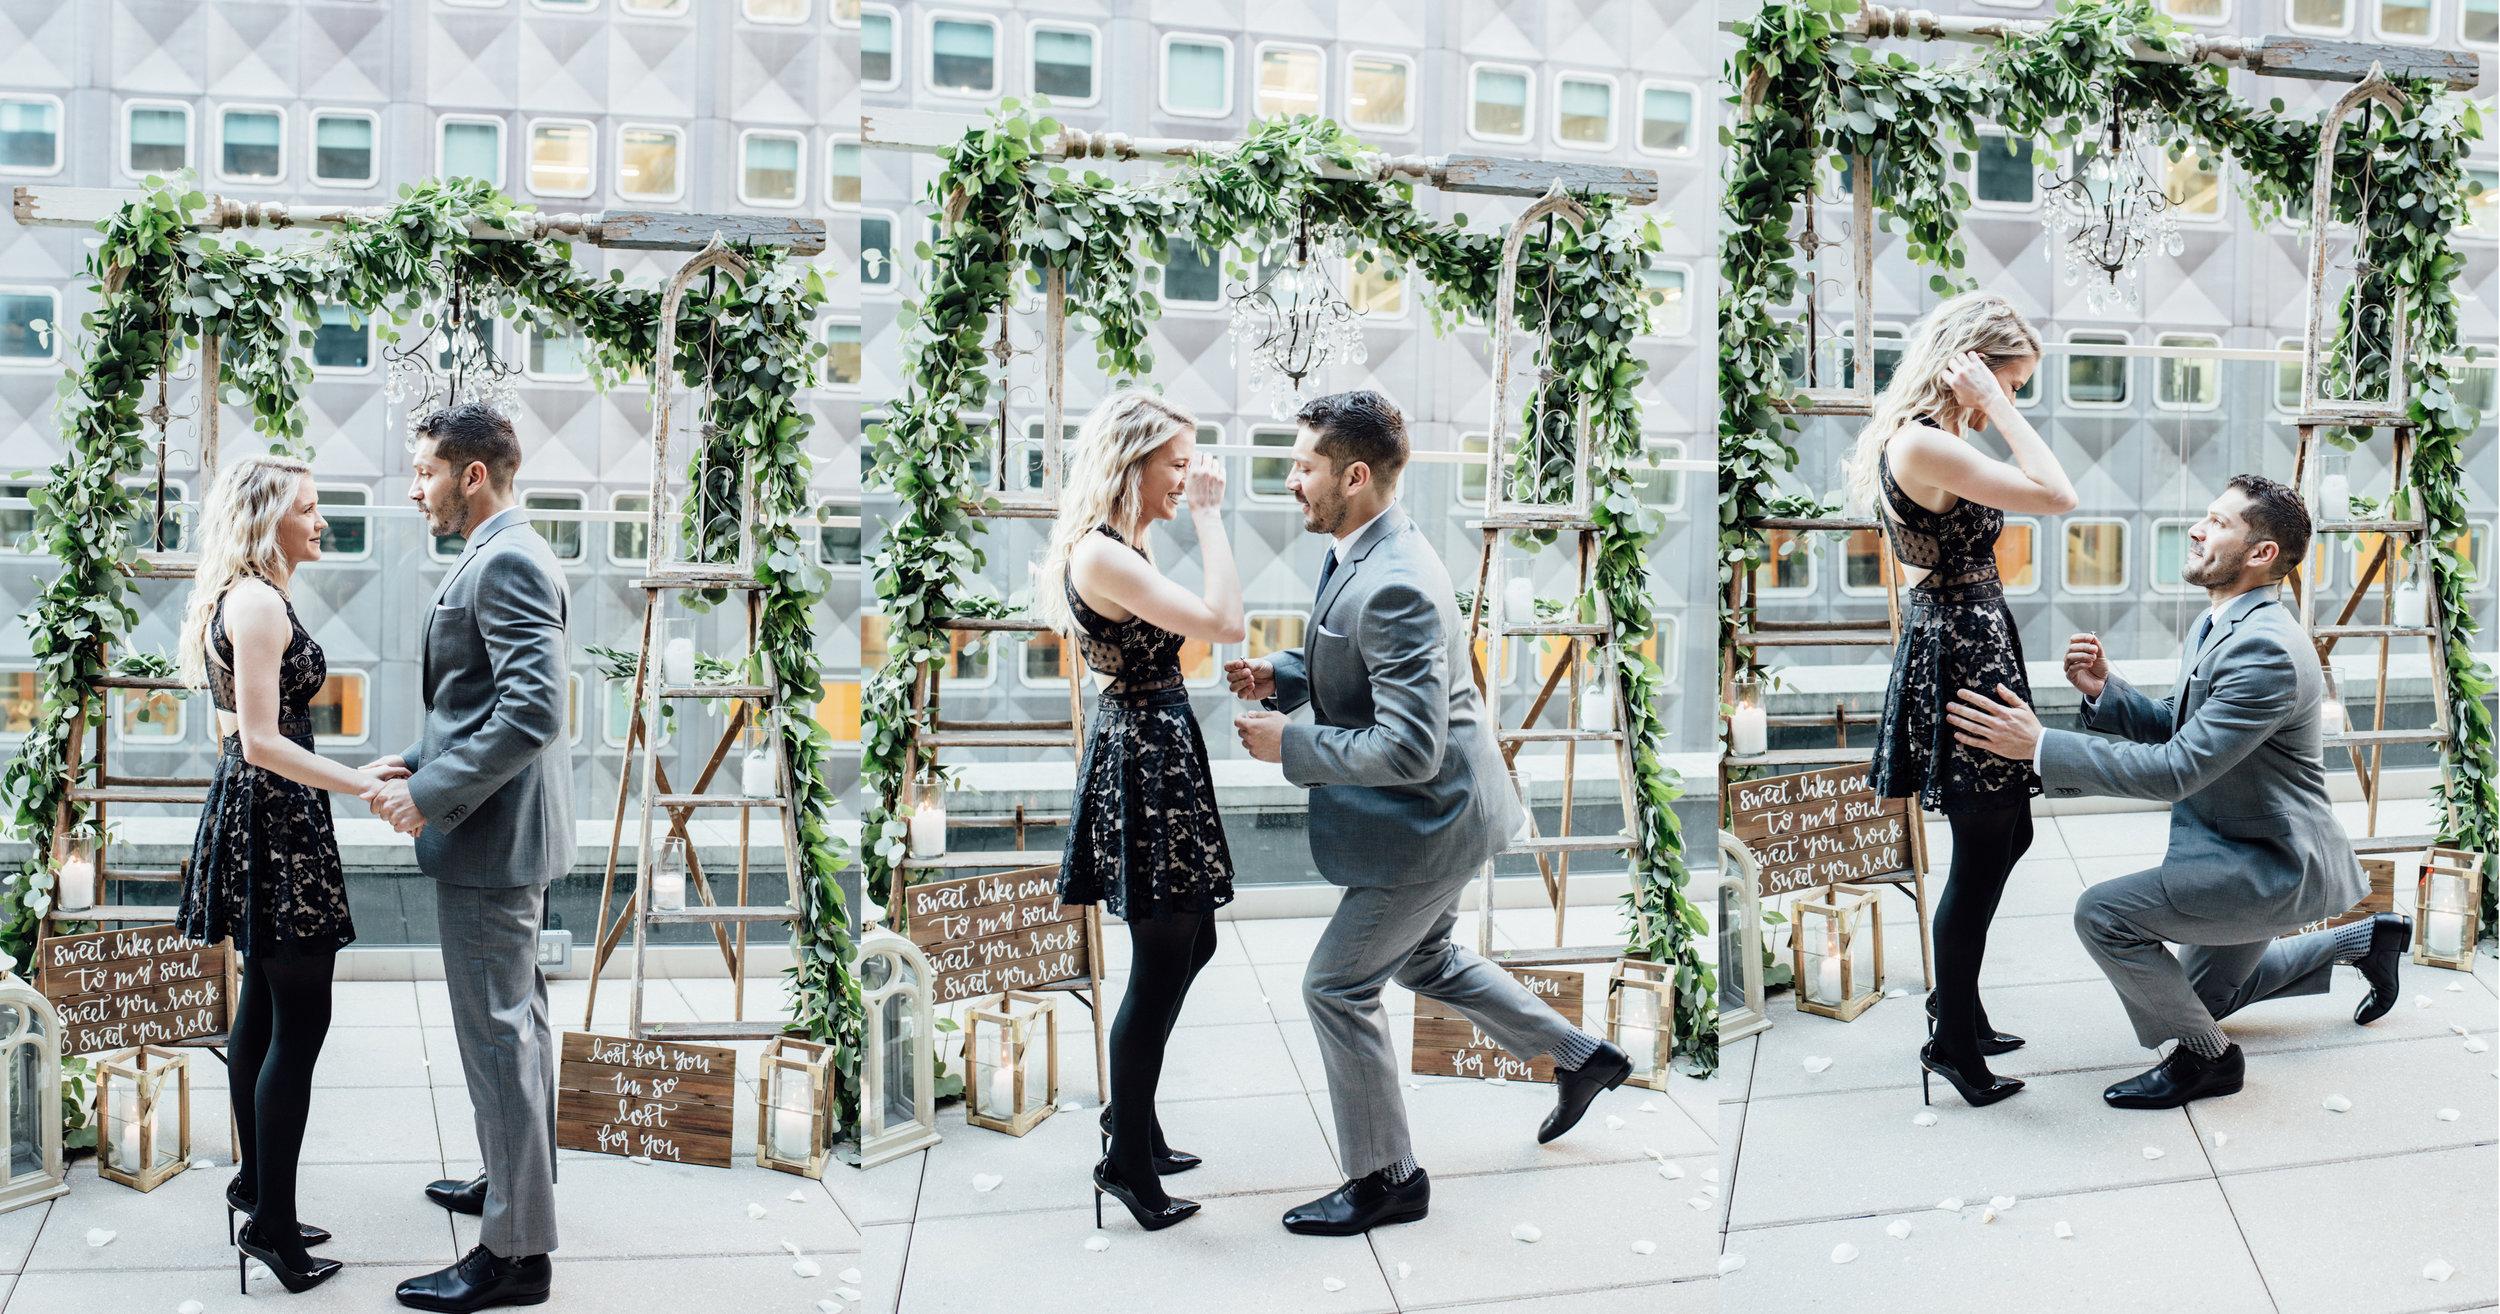 Hotel Monaco Pittsburgh | Wedding Proposal Planners | Exhale Events | Bent Knee Rooftop